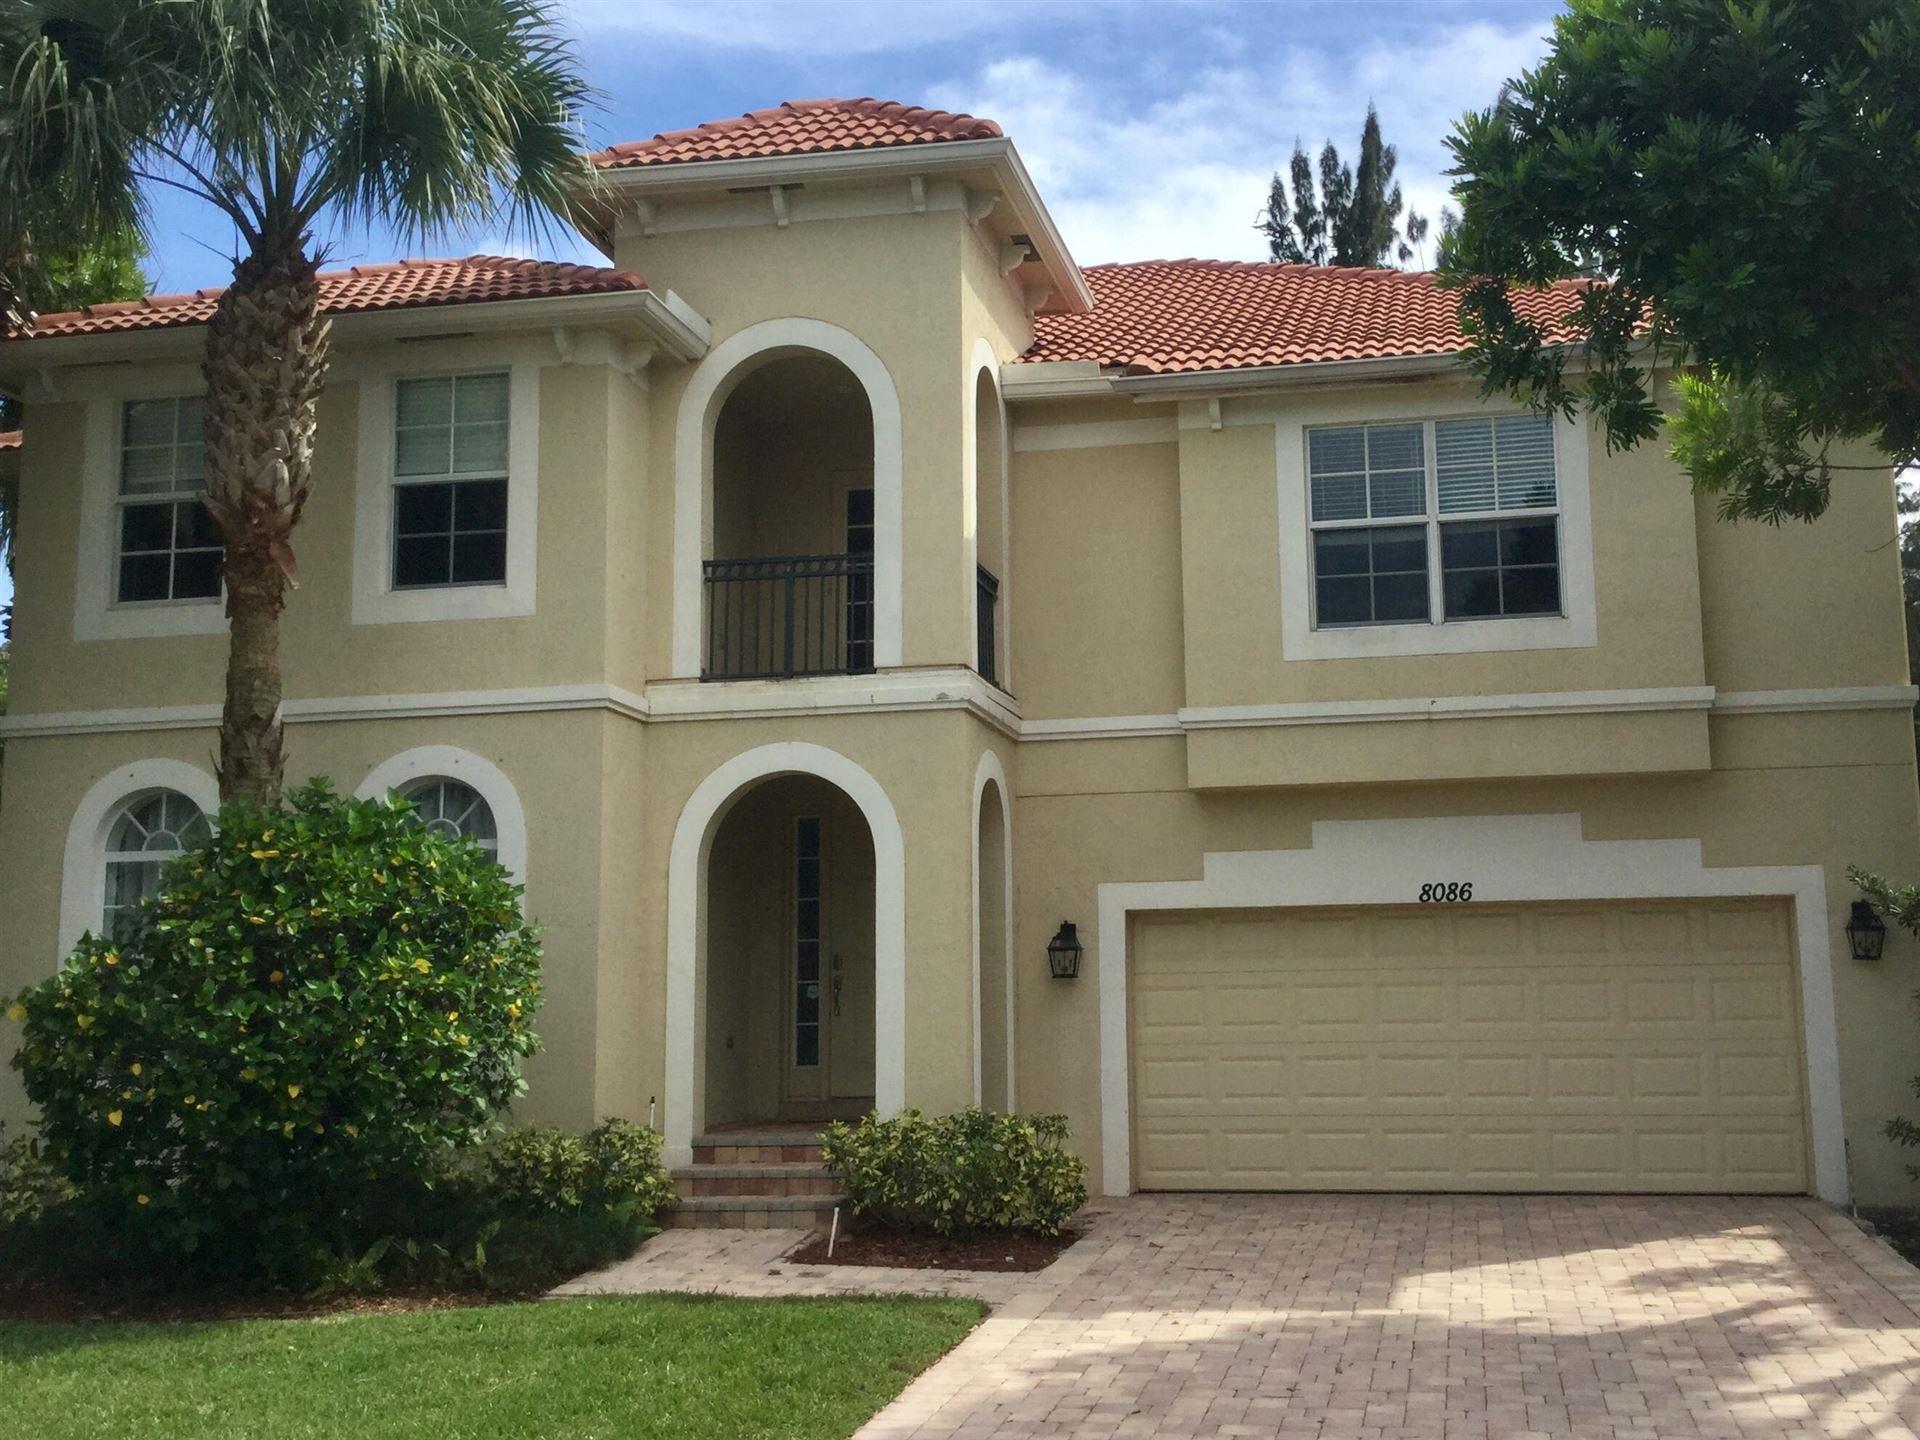 8086 Bautista Way, Palm Beach Gardens, FL 33418 - #: RX-10750522